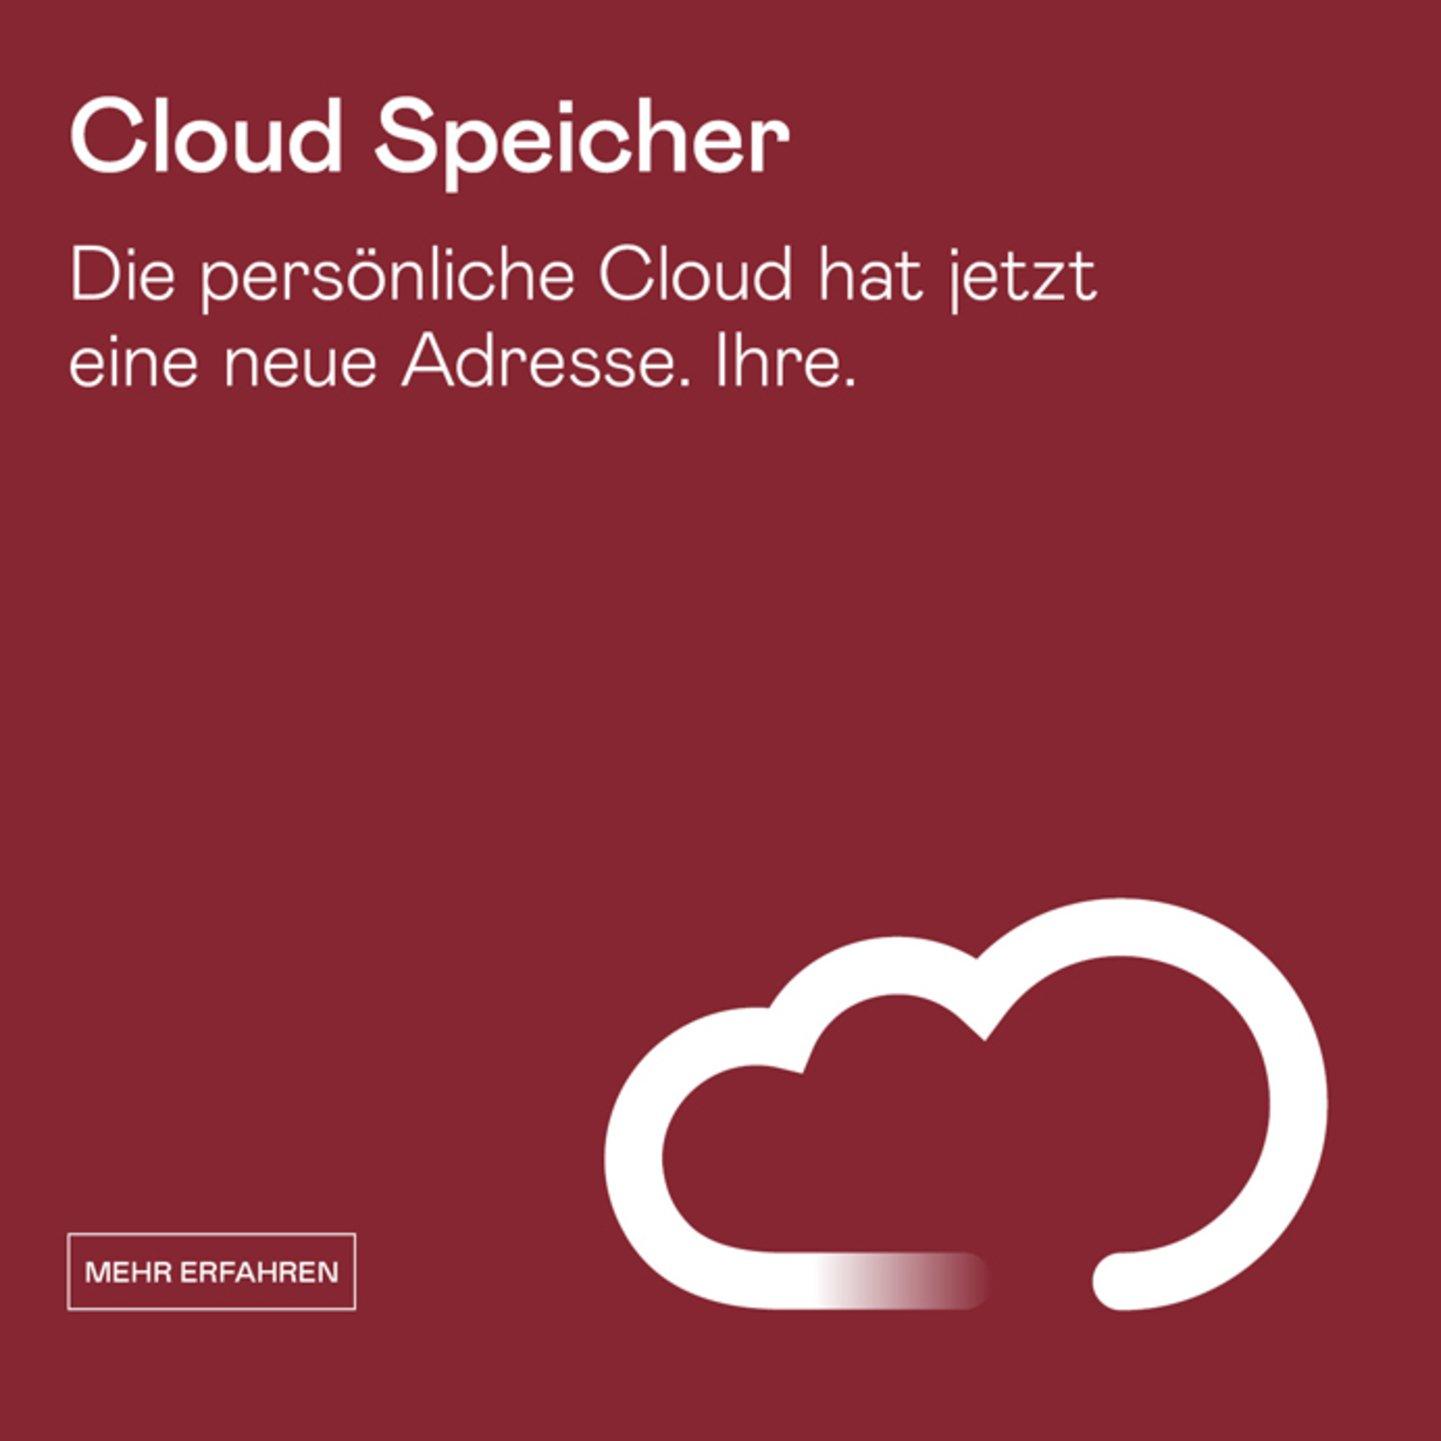 Cloud Speicher